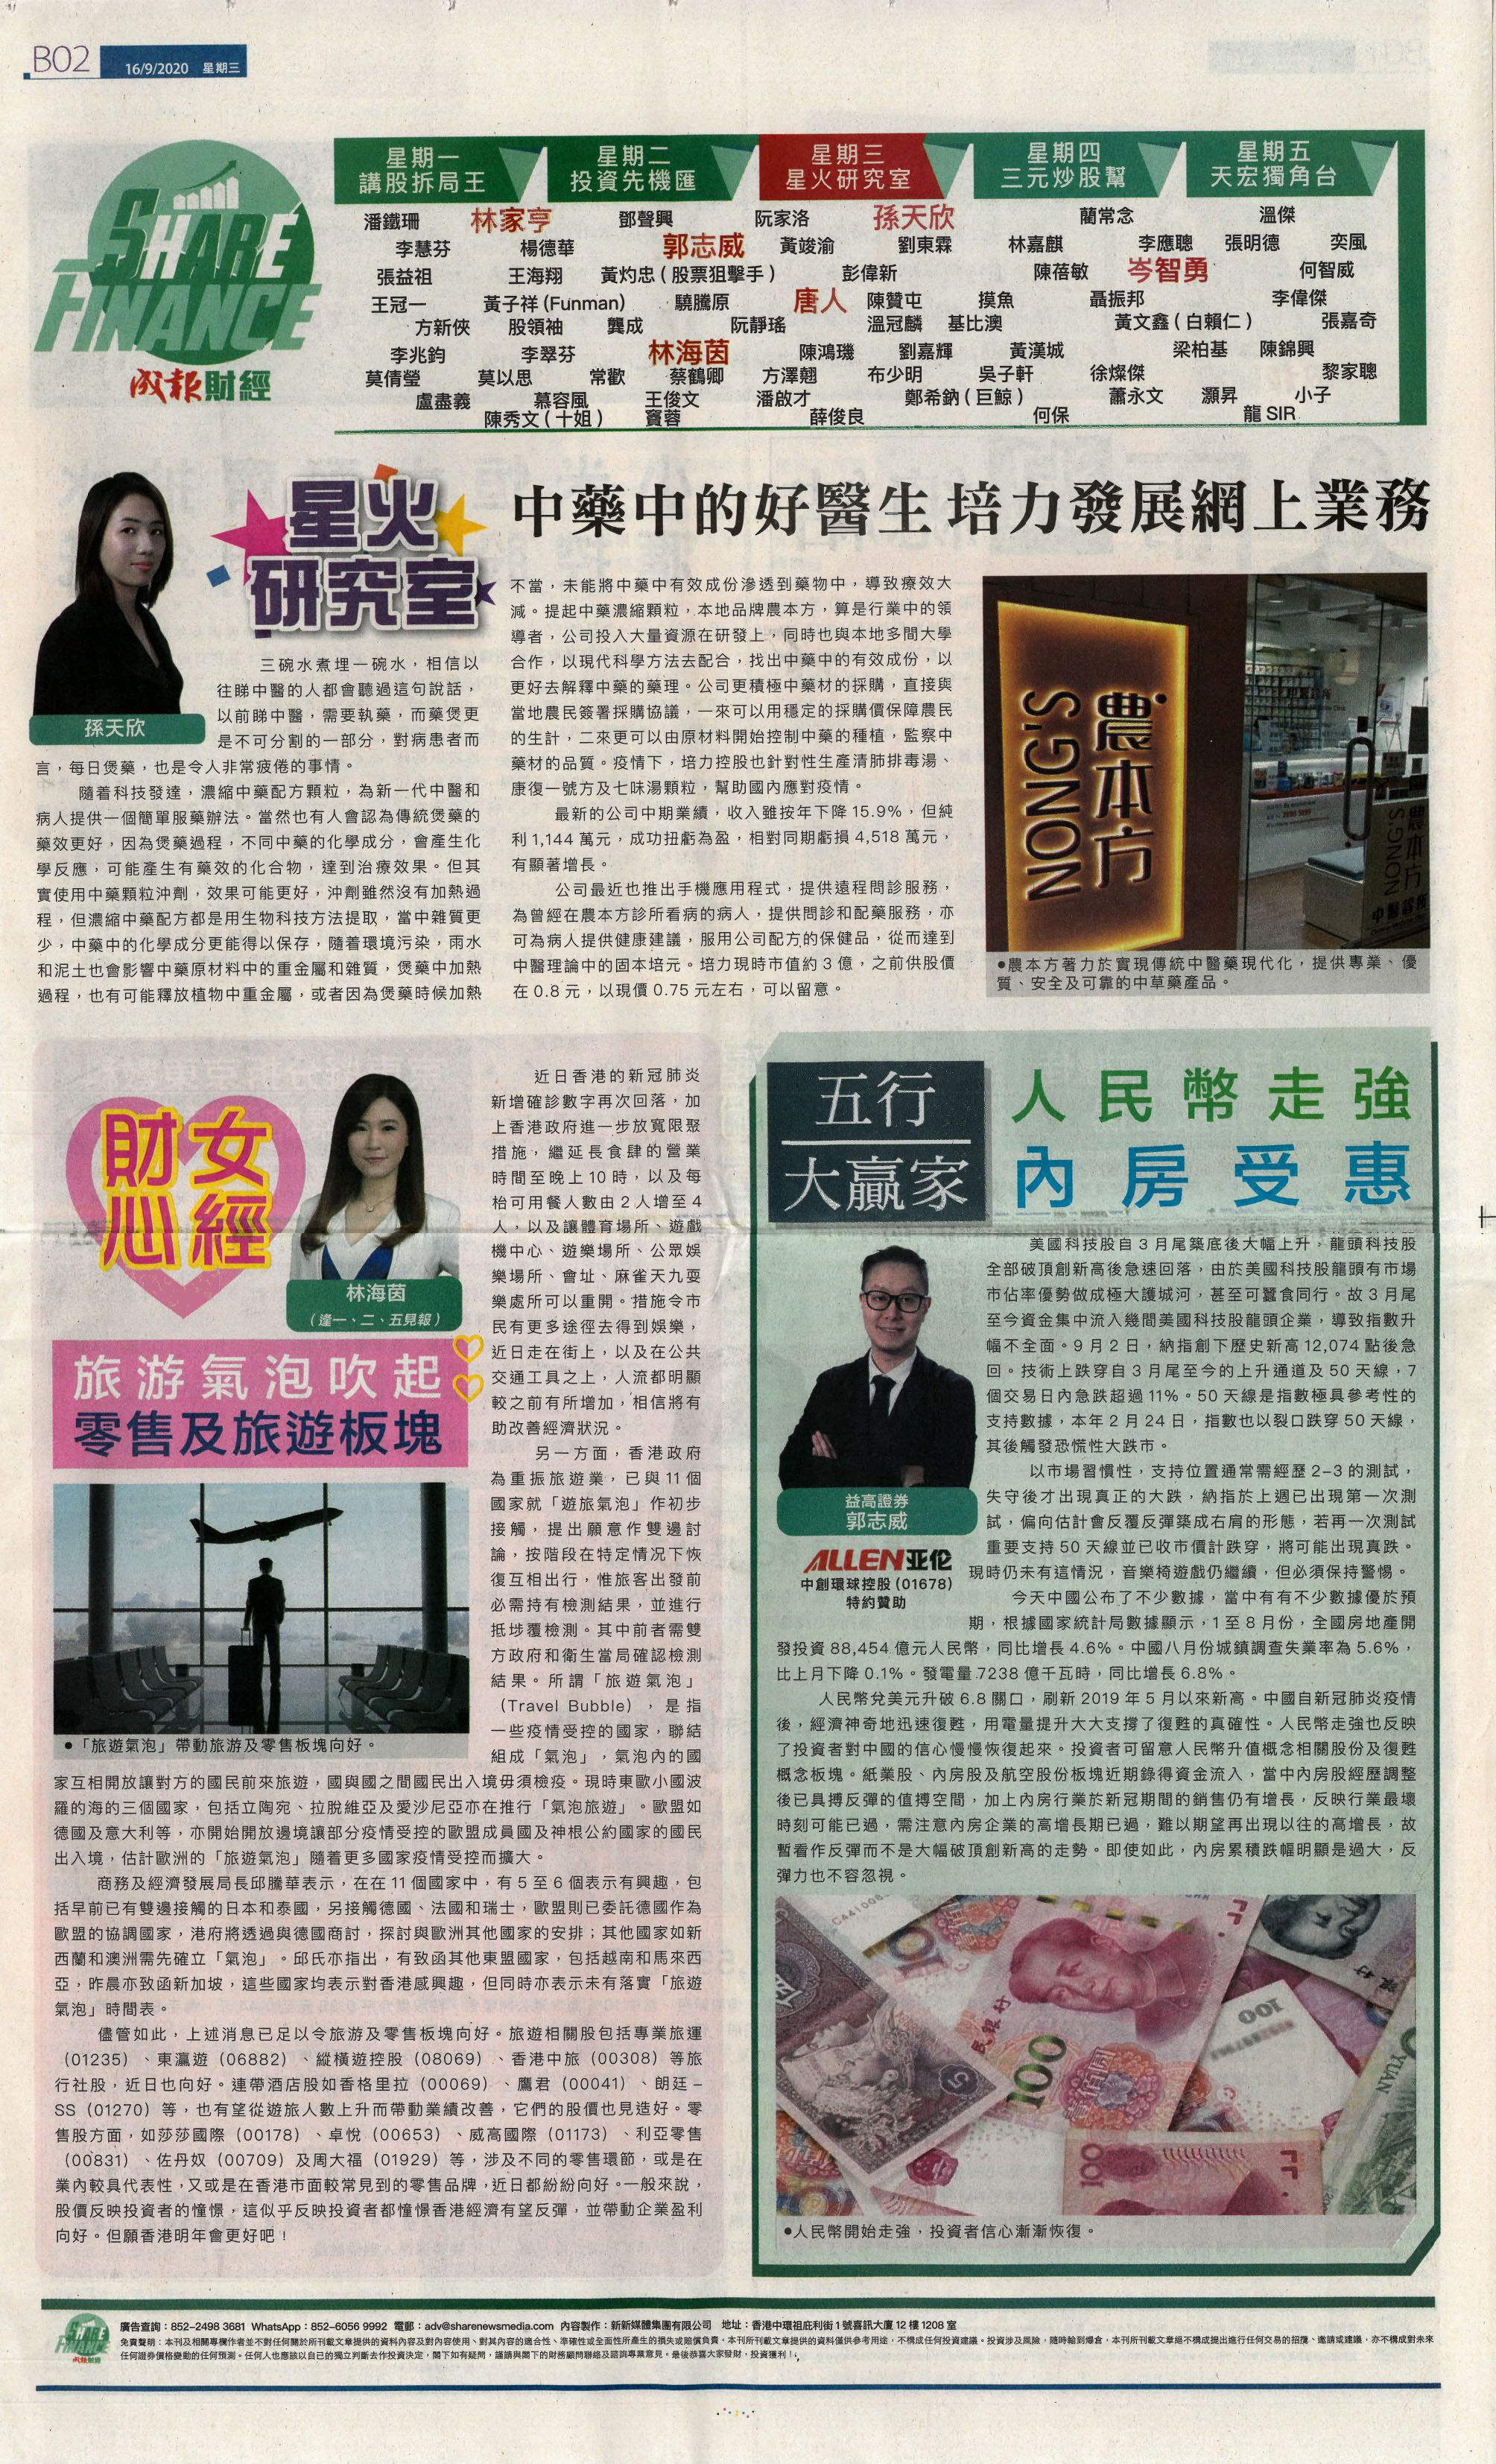 2020-09-16 Sing Pao 成報 page B2 - '中藥中的好醫生培力發展網上業務' (scan copy) (16 Sep 2020)_頁面_2